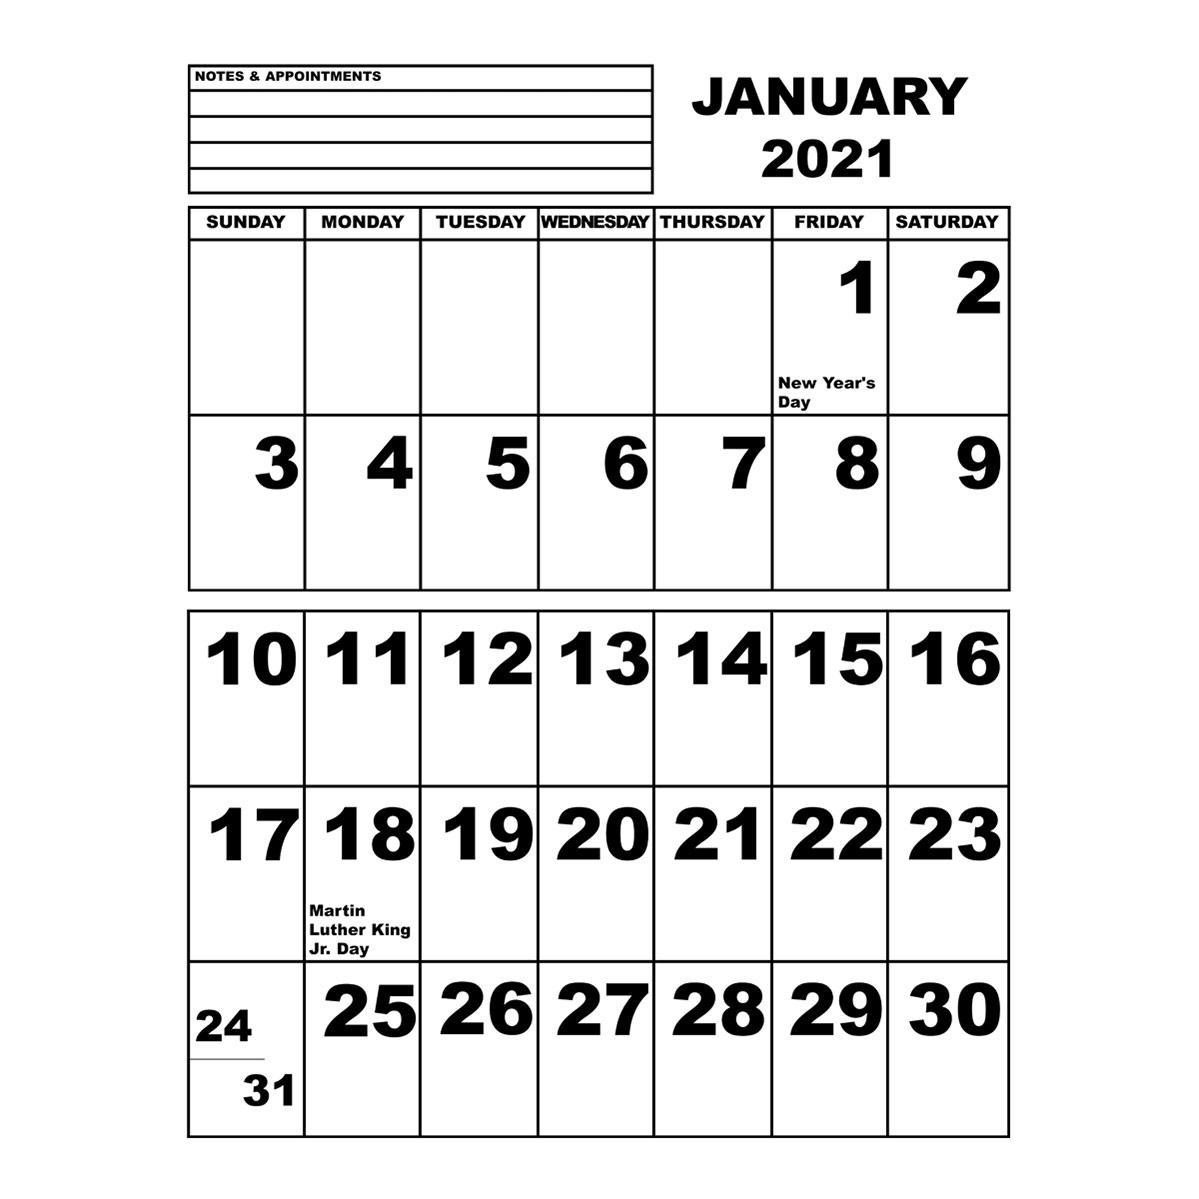 Jumbo Print Calendar - 2021